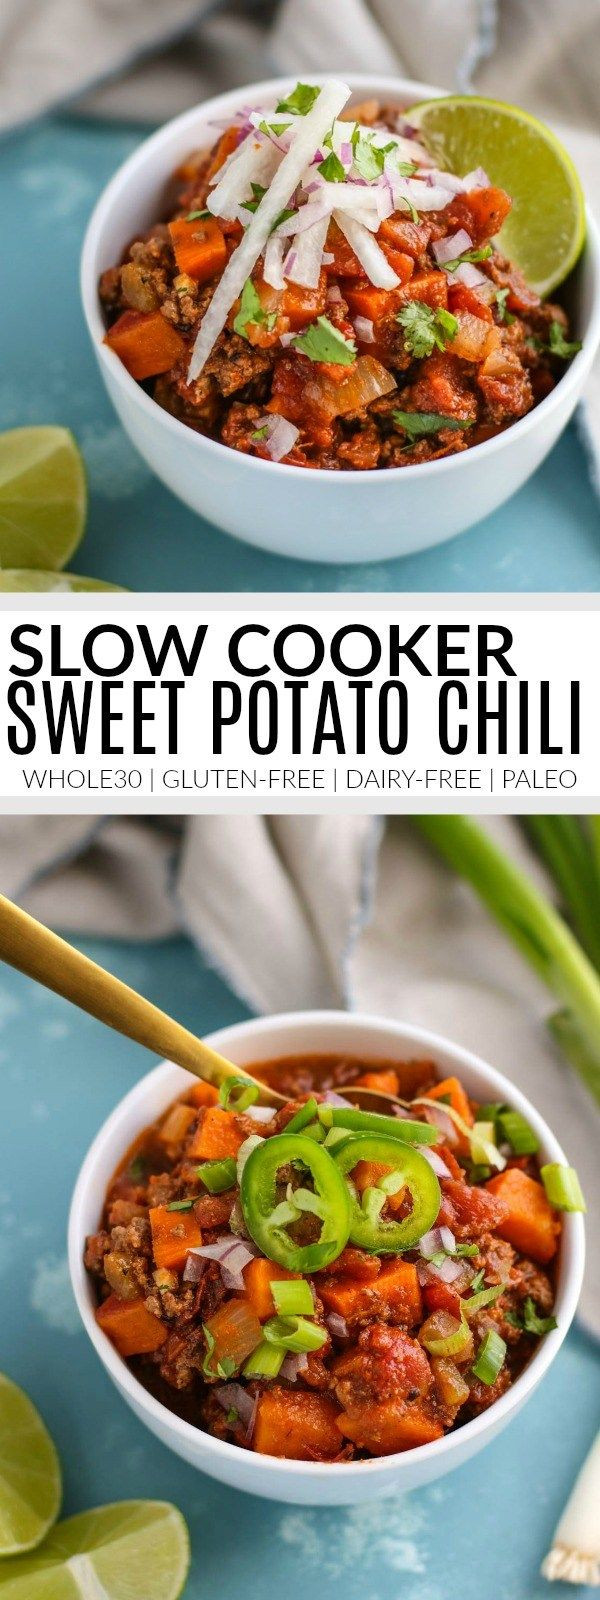 Slow Cooker Sweet Potato Recipes Healthy  Best 25 Acai recipes ideas on Pinterest